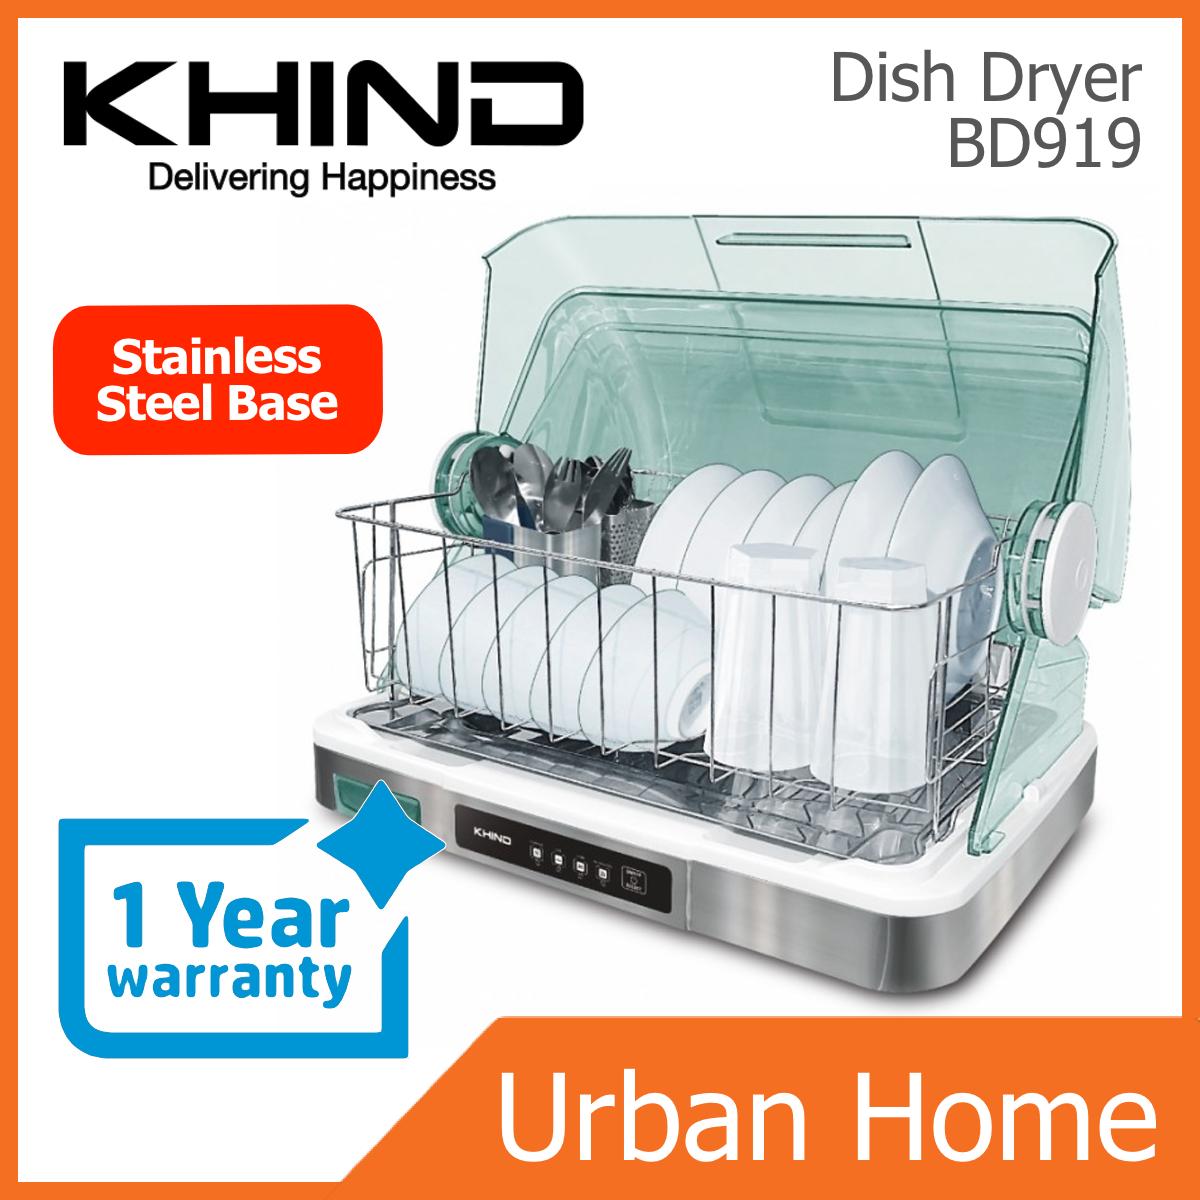 KHIND Bowl Dish Dryer (BD919)